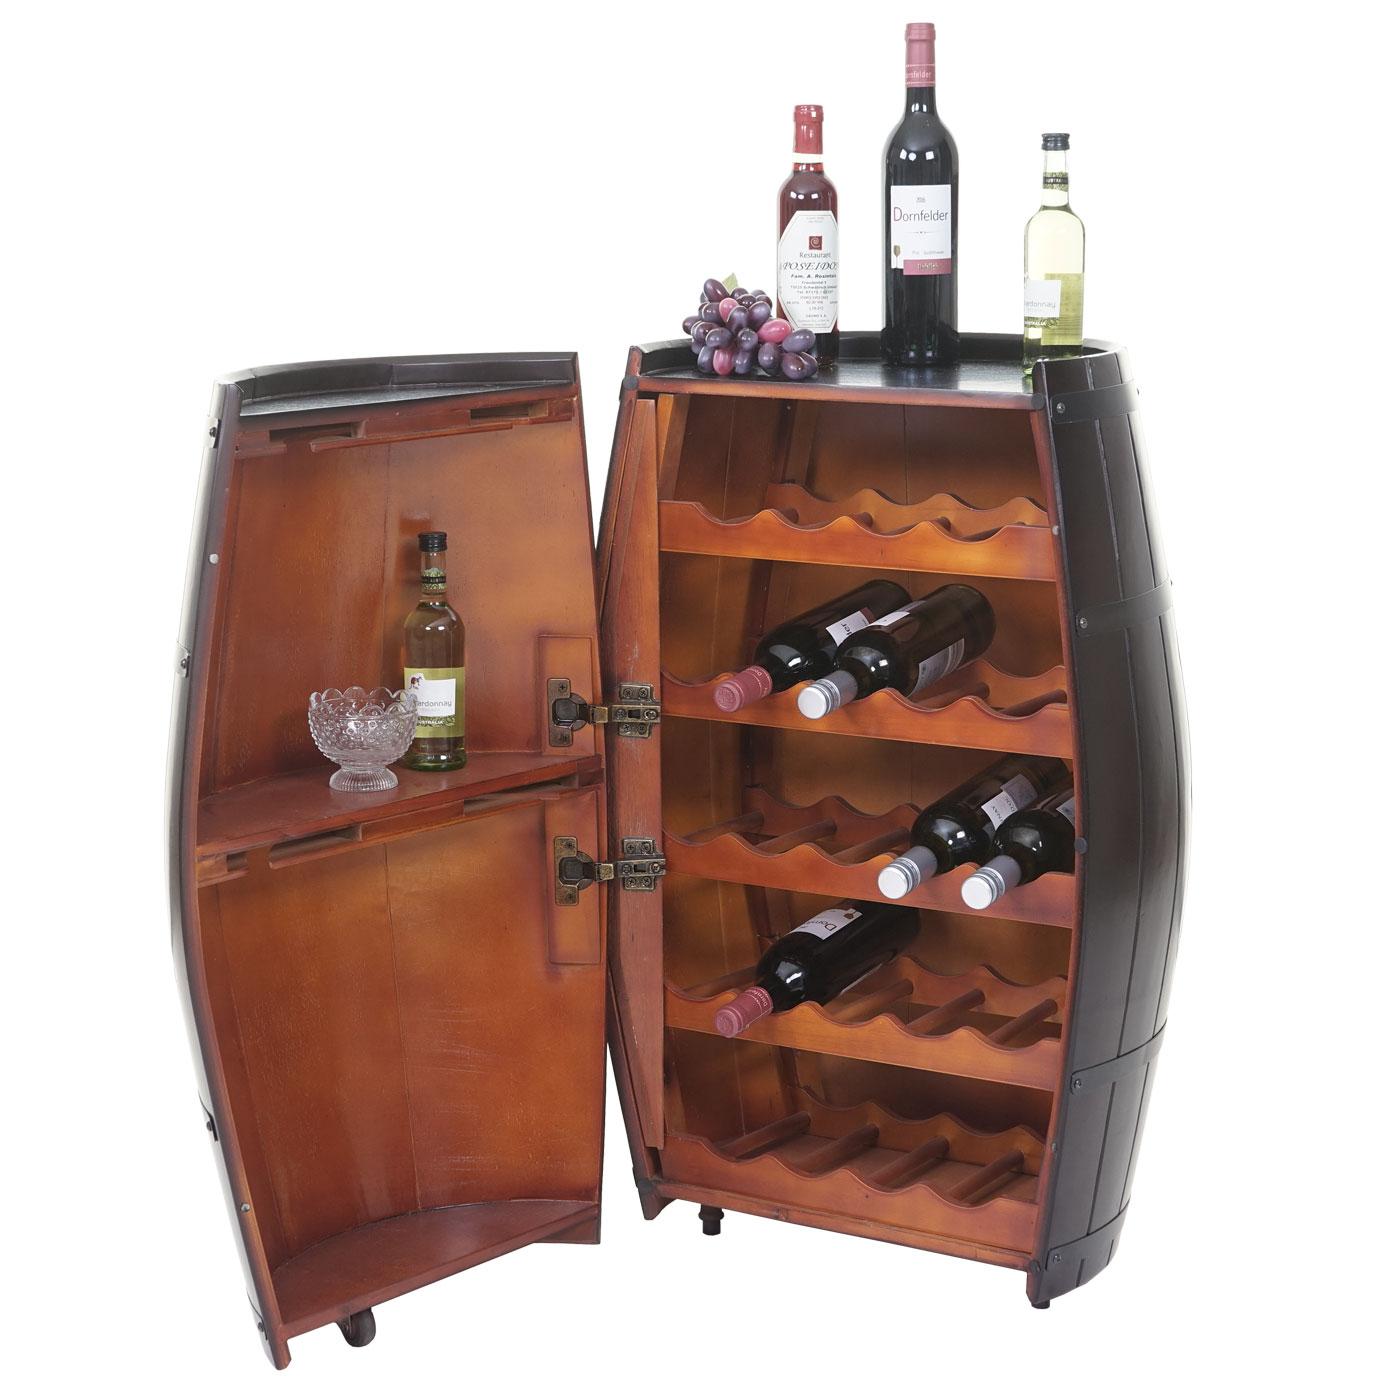 weinregal hwc t877 flaschenregal fass holzregal mit t r. Black Bedroom Furniture Sets. Home Design Ideas